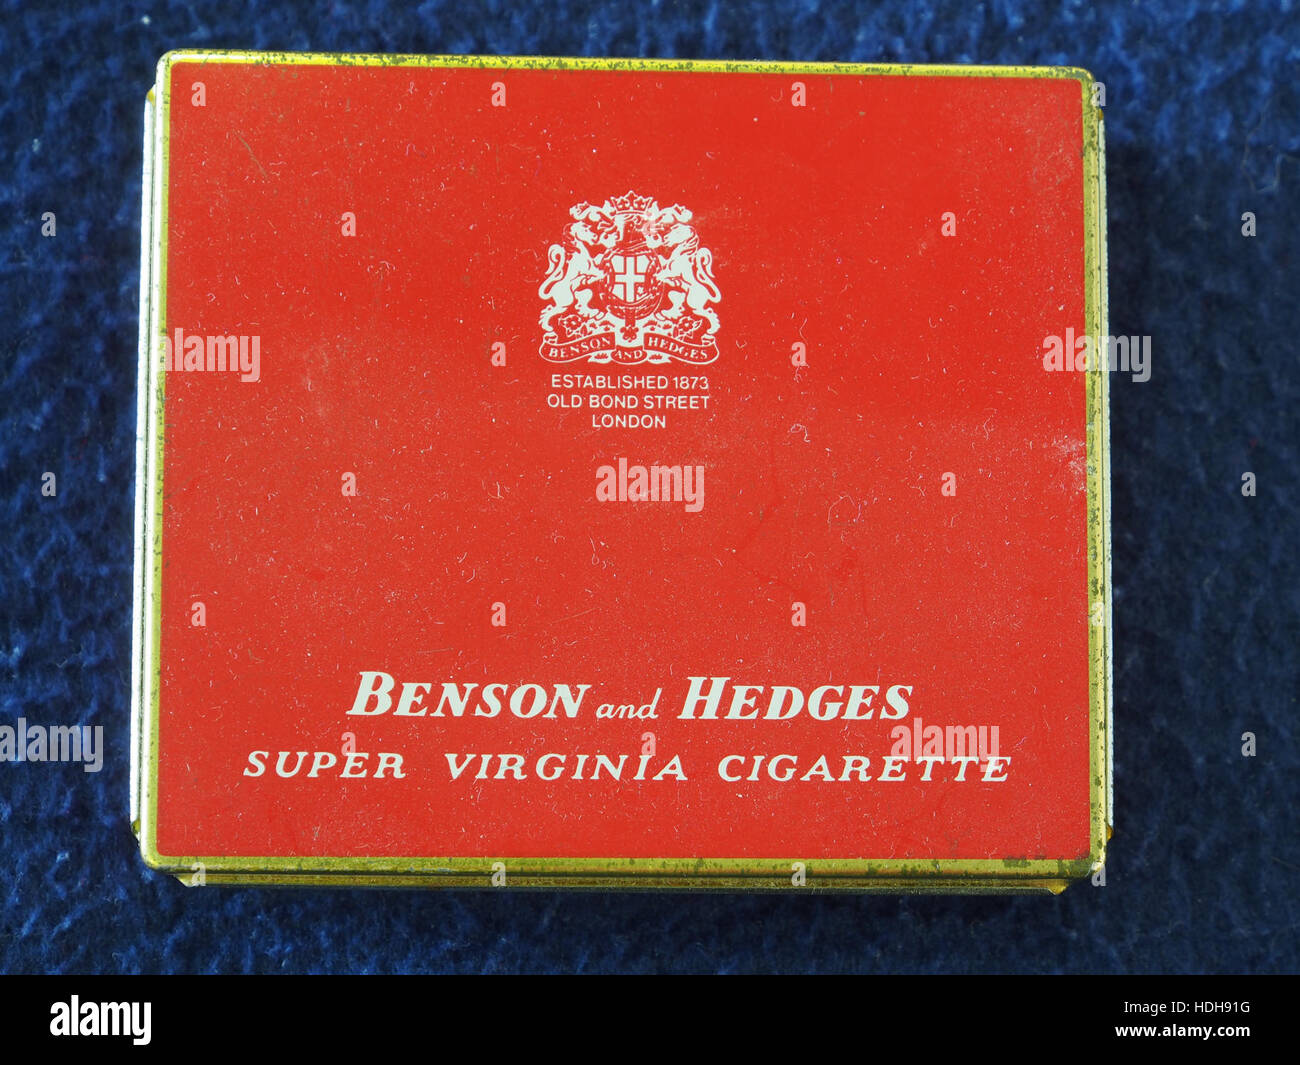 Buy Marlboro cigarettes online in USA